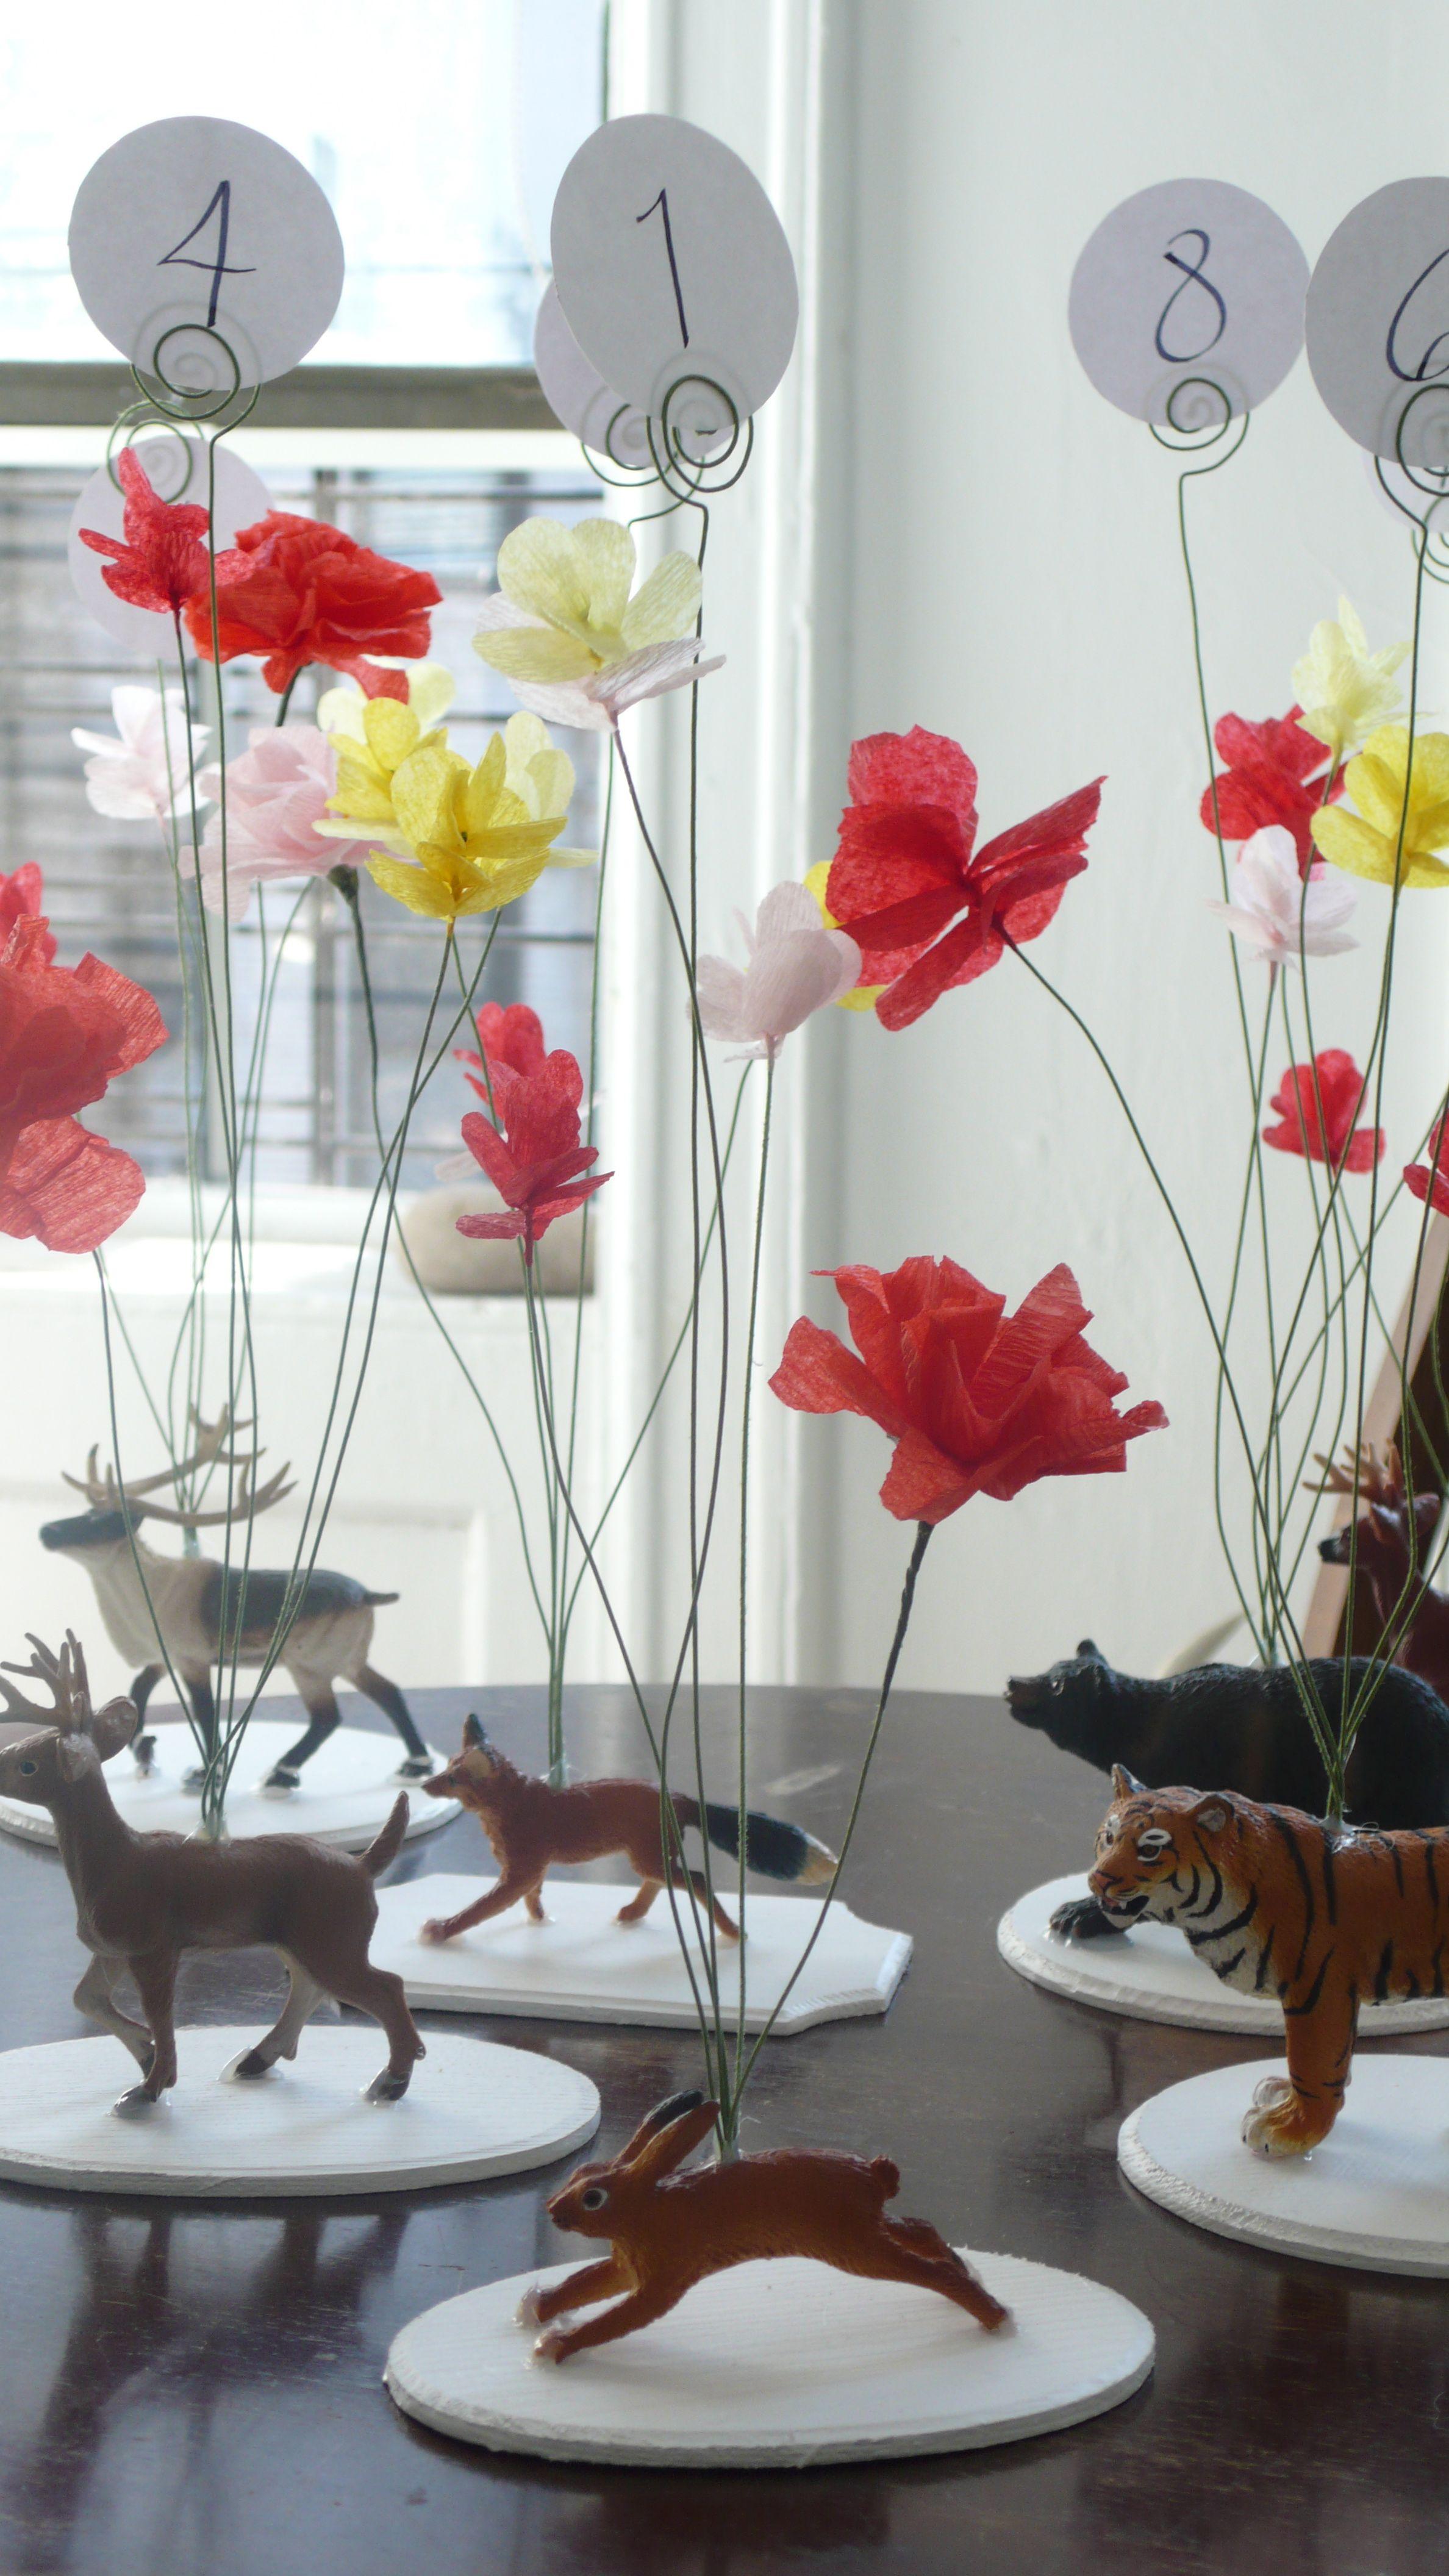 Non-floral wedding centerpieces | Pinterest | Plastic animals ...